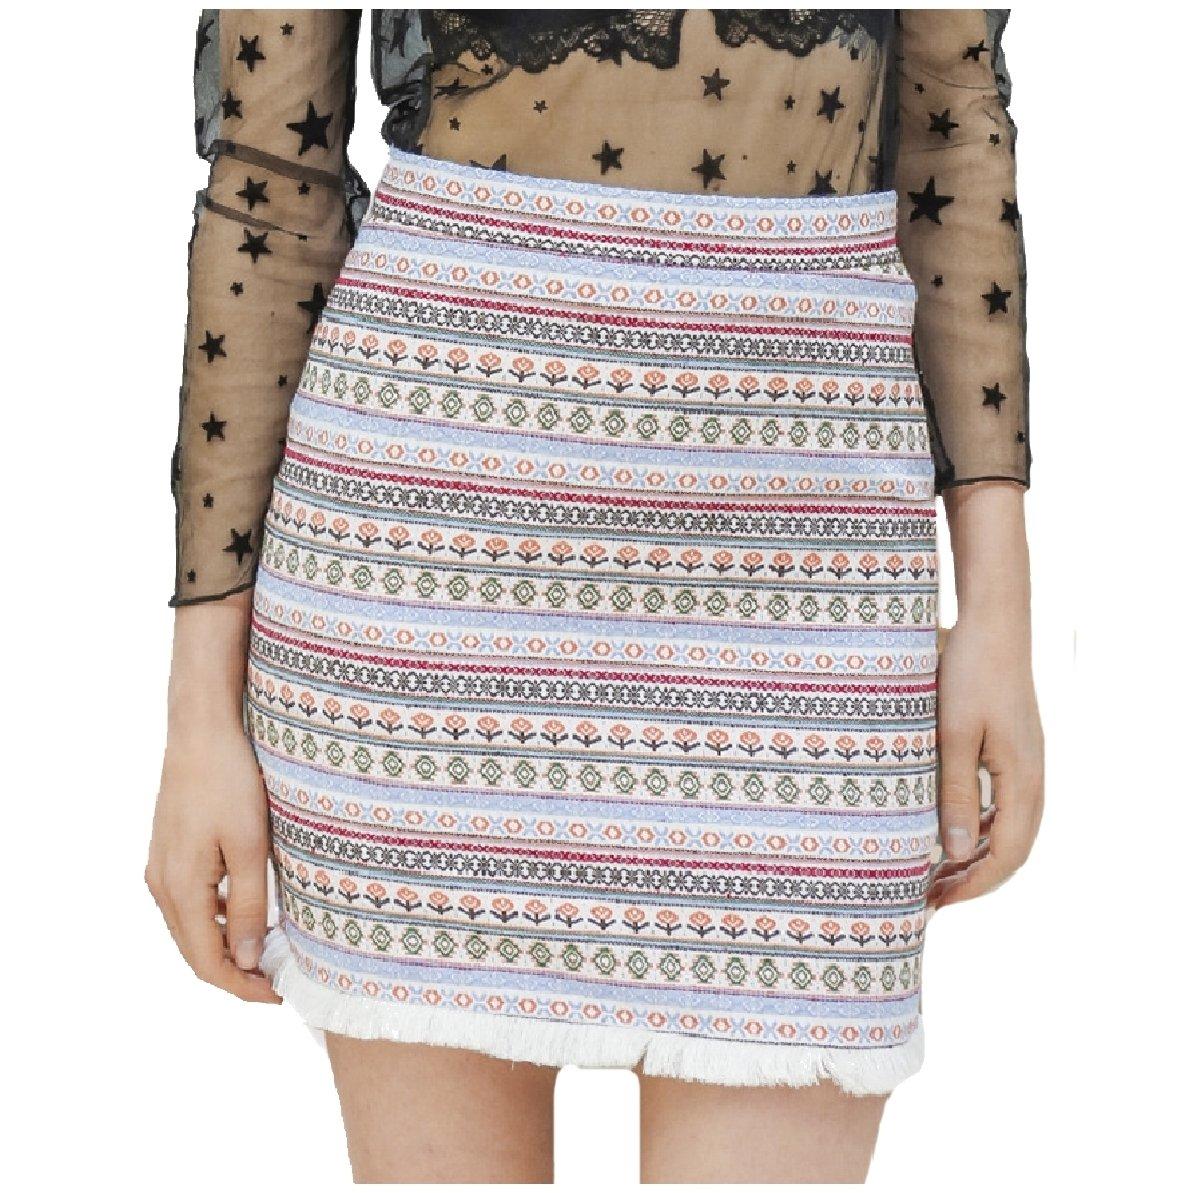 YUNY Womens High Waist Fine Cotton Pencil Ethnic Style Fringe Skirt White S